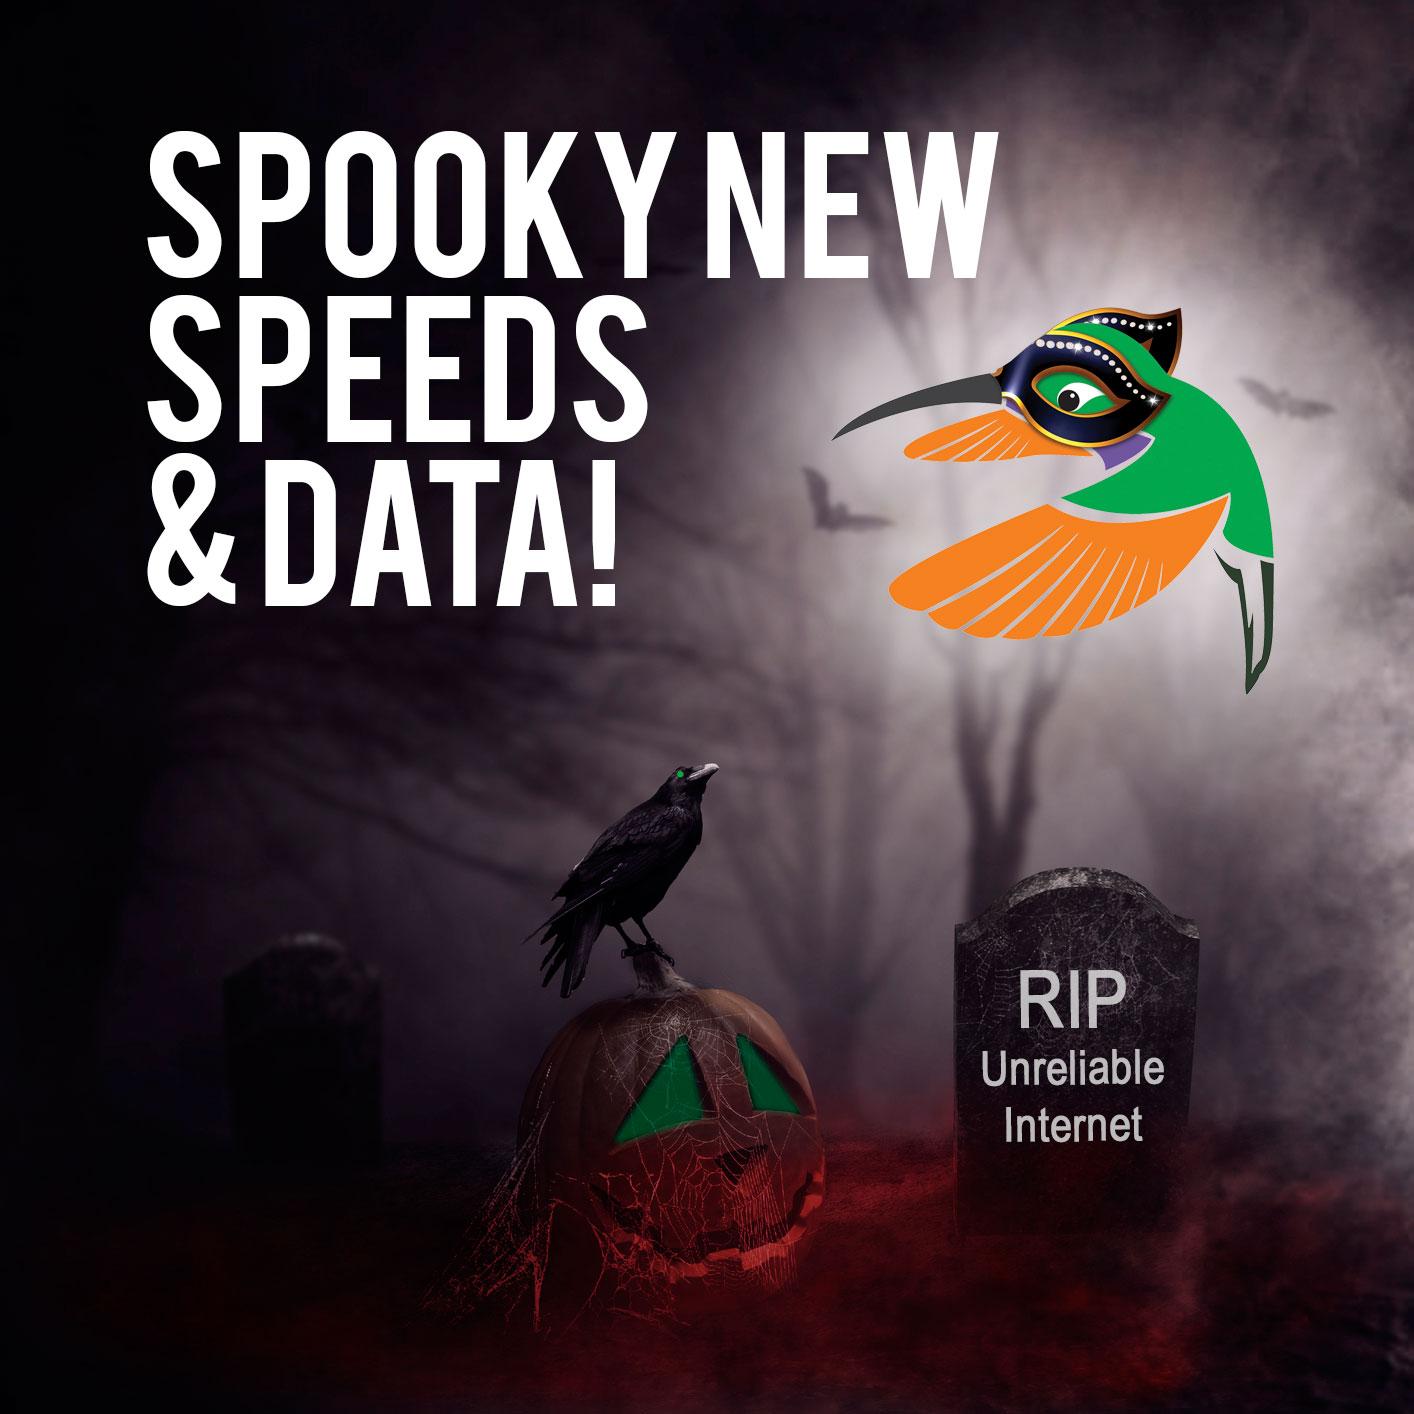 spooky-good-speeds-internet-plans - GoBrolly Internet - \